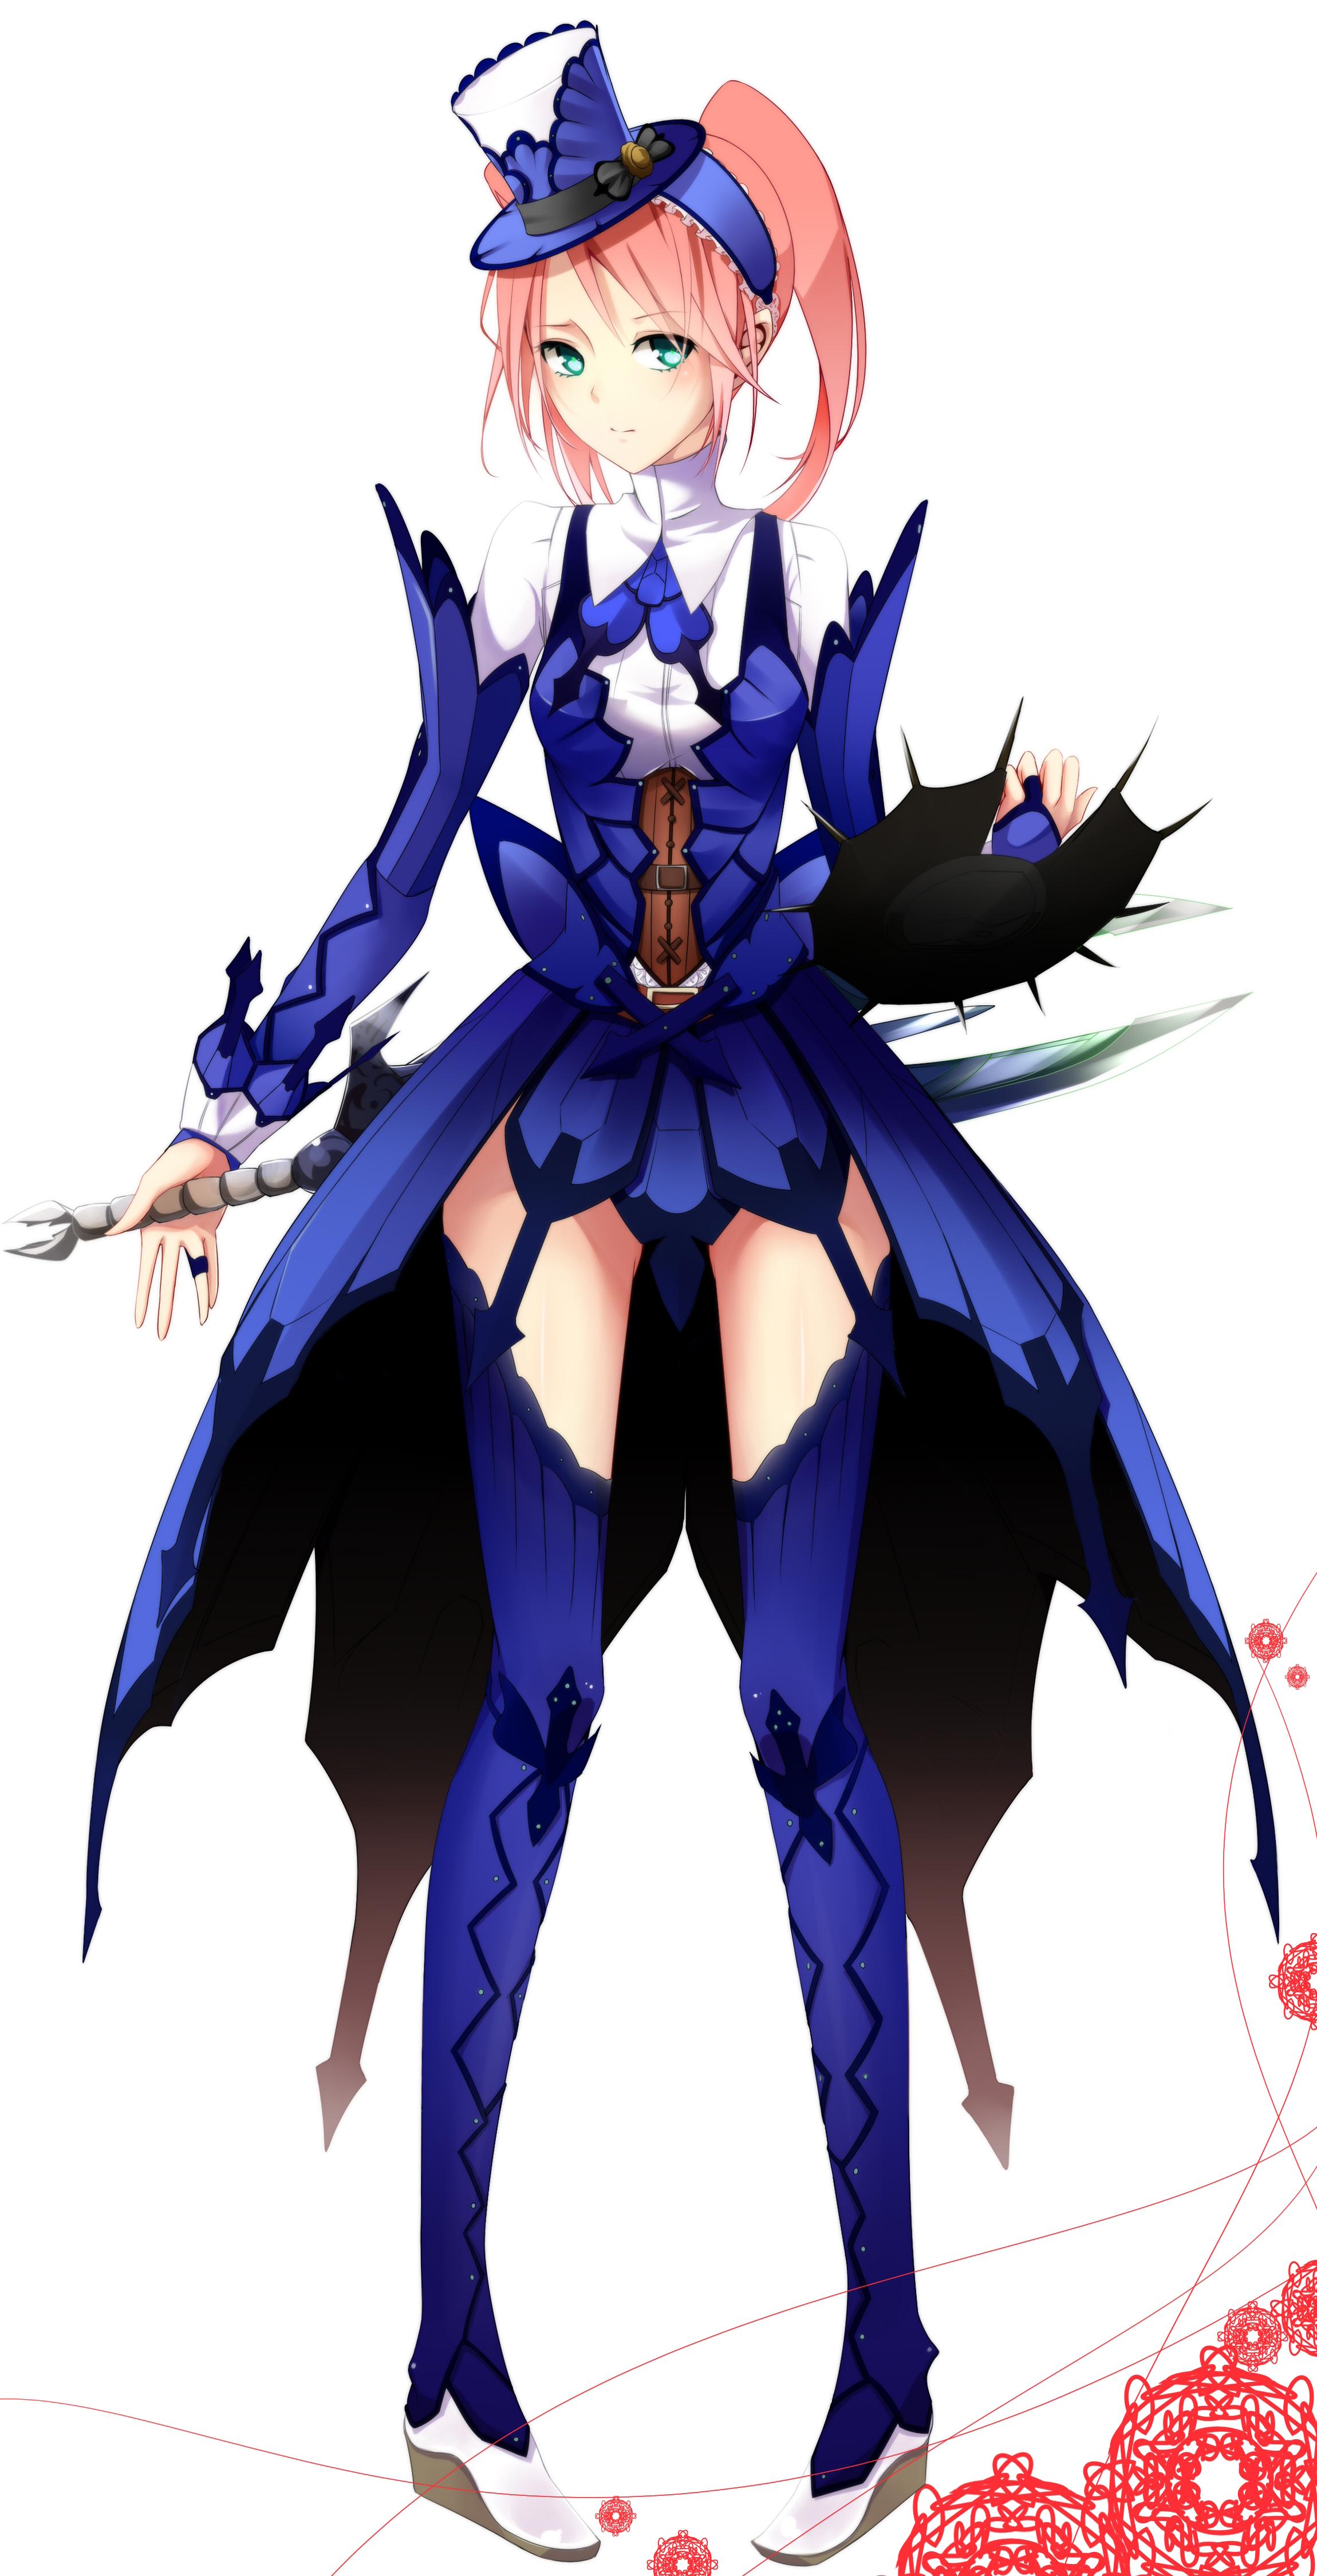 Monster Hunter Series Image 1249193 Zerochan Anime Image Board